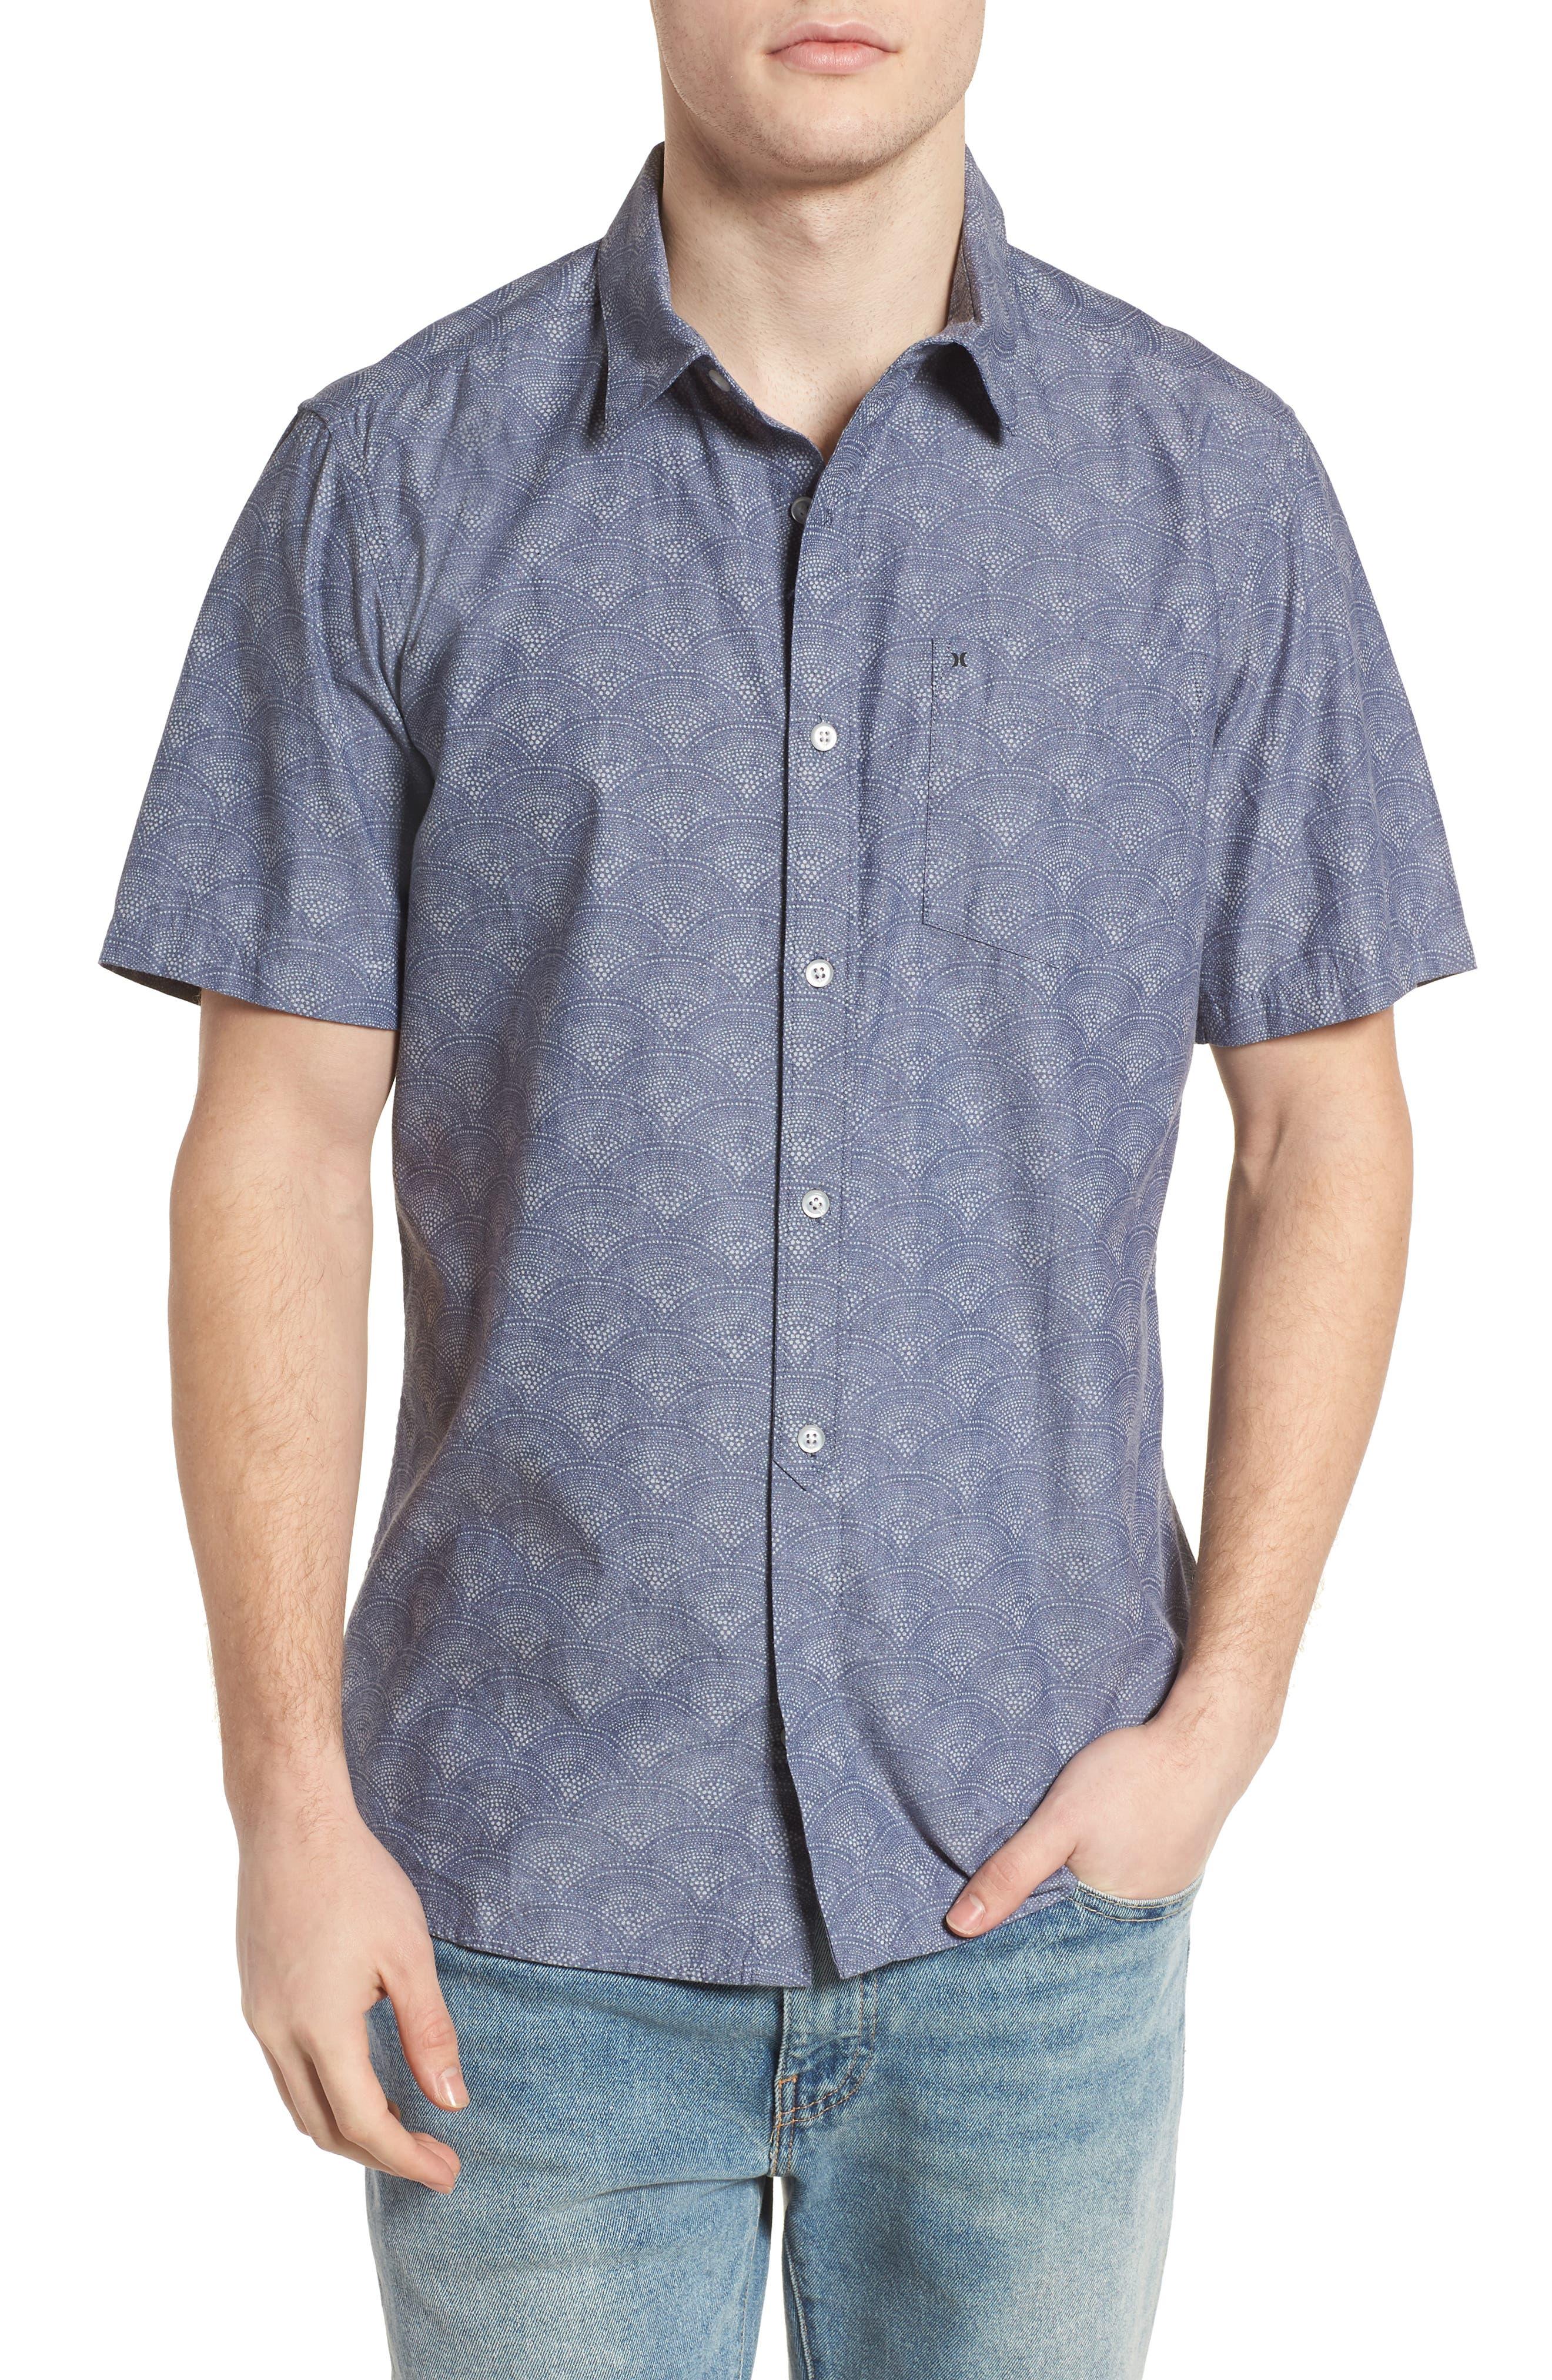 Pescado Short Sleeve Oxford Shirt,                             Main thumbnail 1, color,                             Obsidian